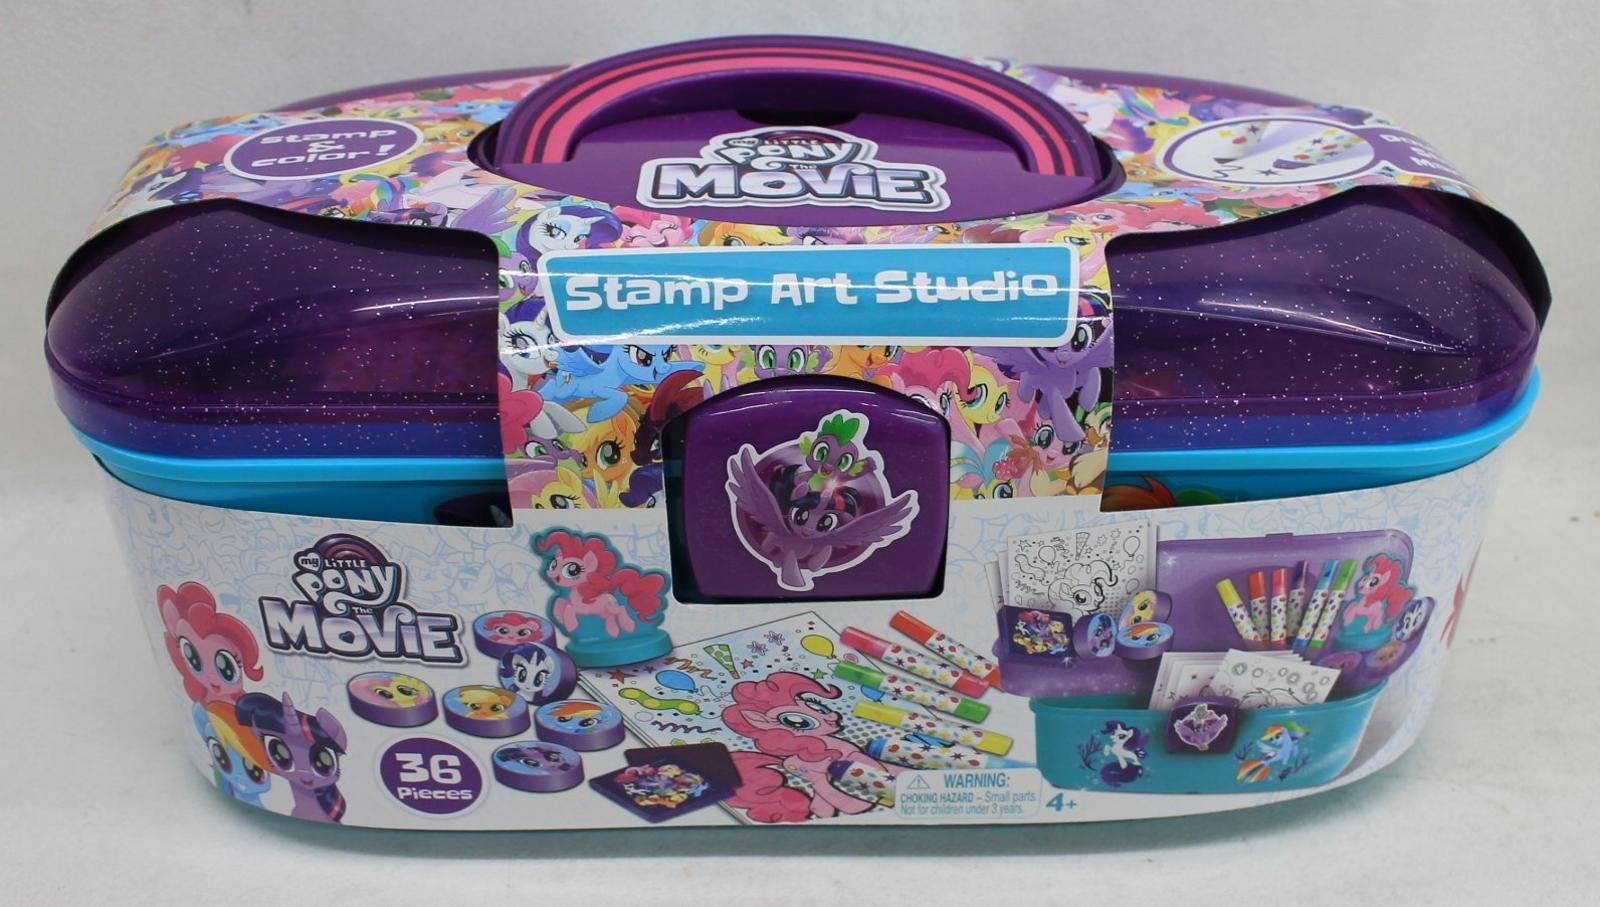 CANAL TOYS 465023 My Little Pony The Movie 36-Piece Stamp Art Studio Set NEW